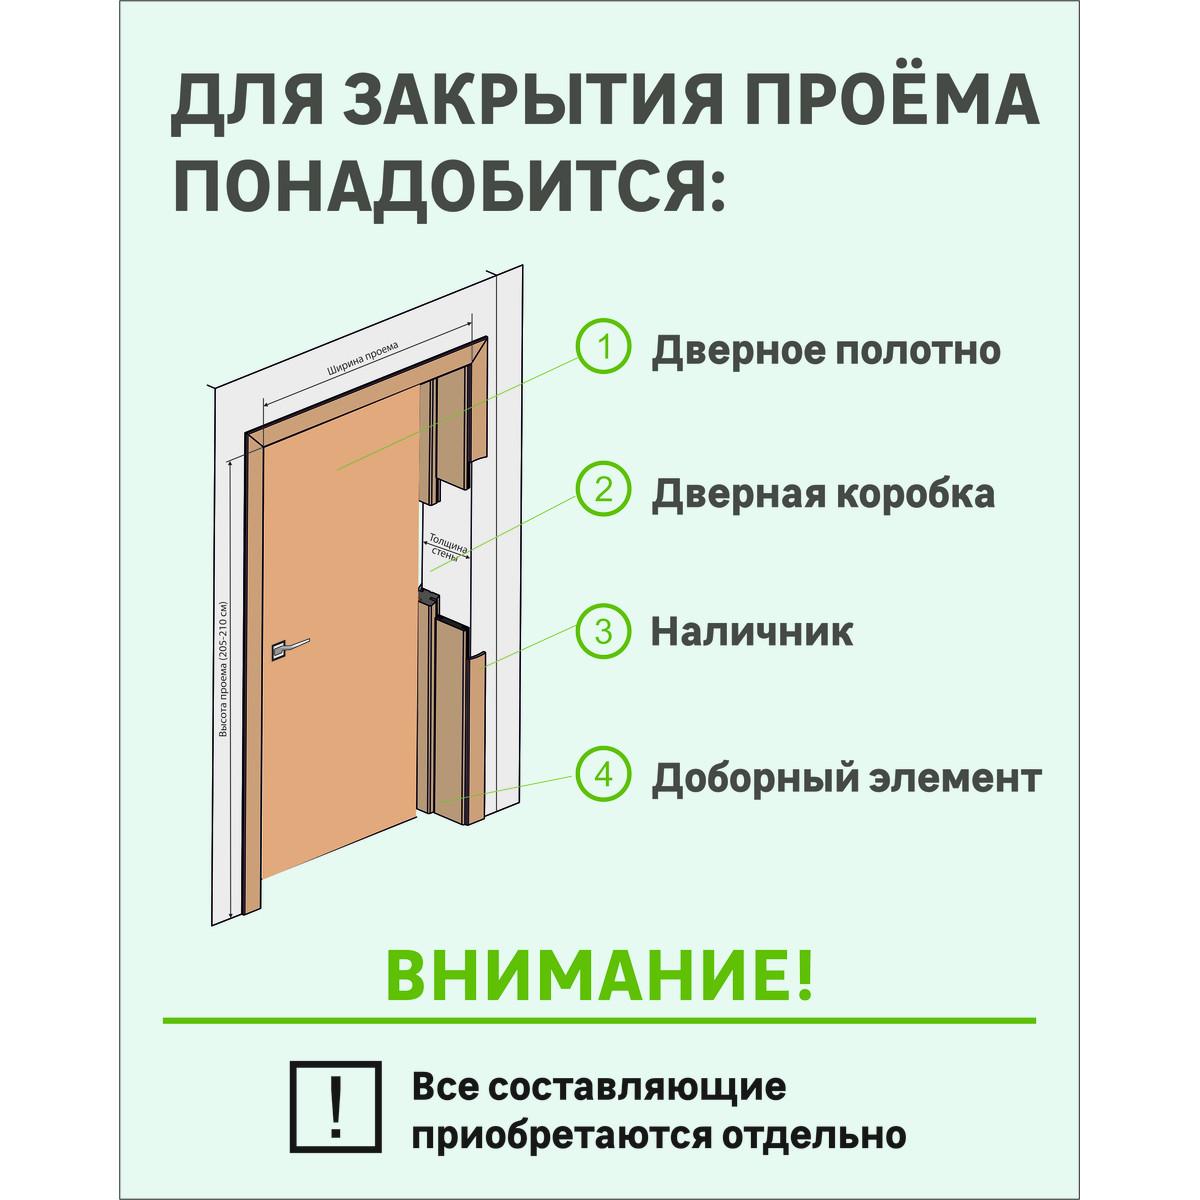 Дверь Межкомнатная Глухая С Замком В Комплекте Афина 90x200 Экошпон Цвет Белый